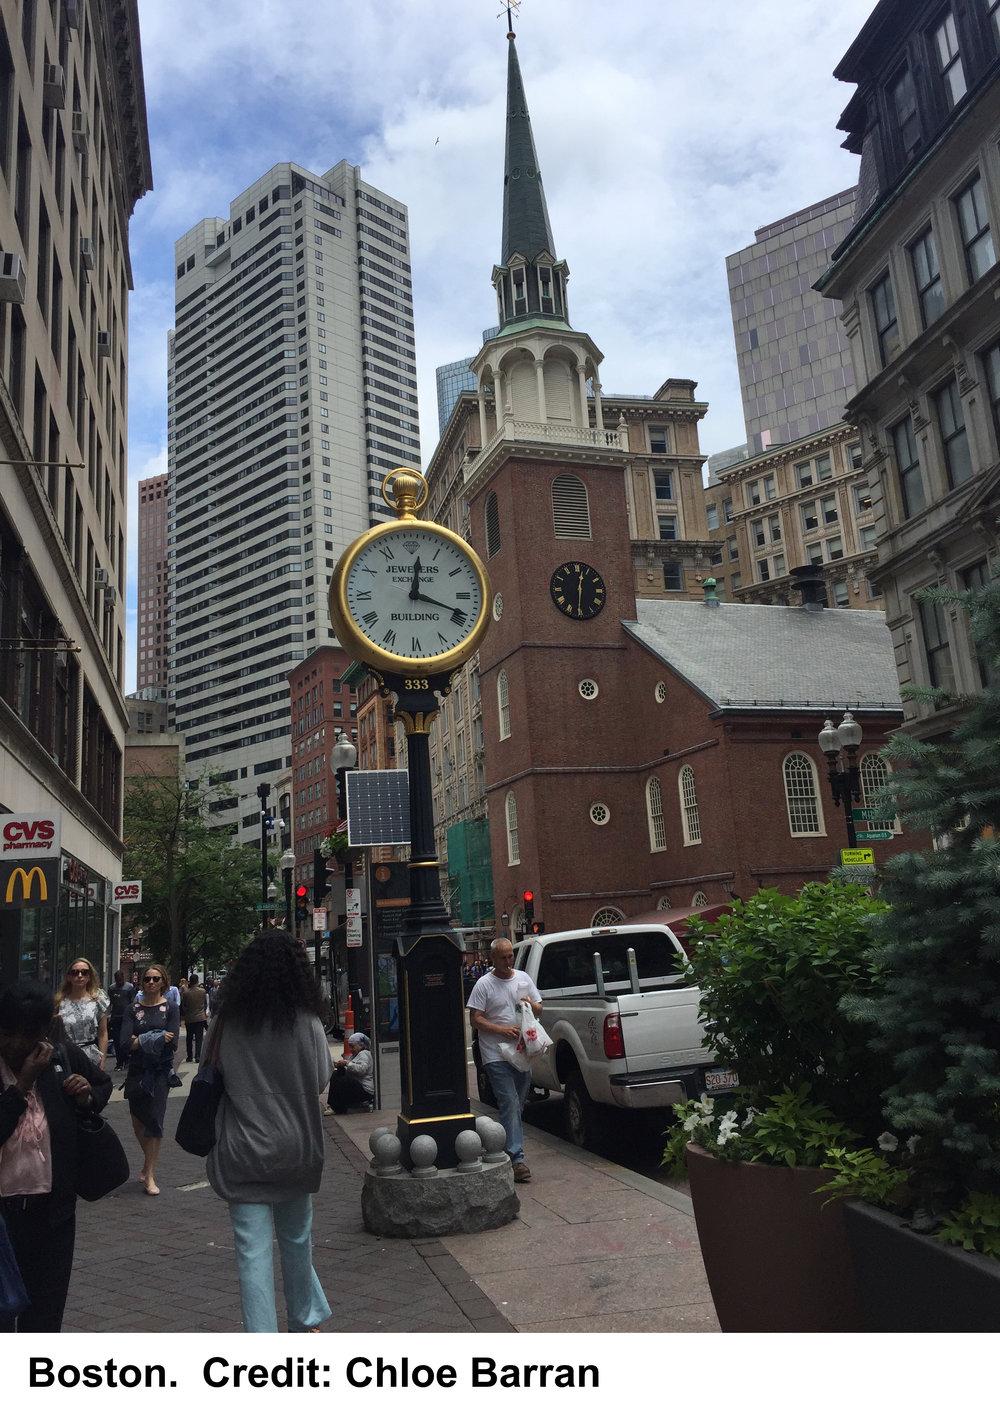 2018-06-13 12.19.10-2 Boston.jpg